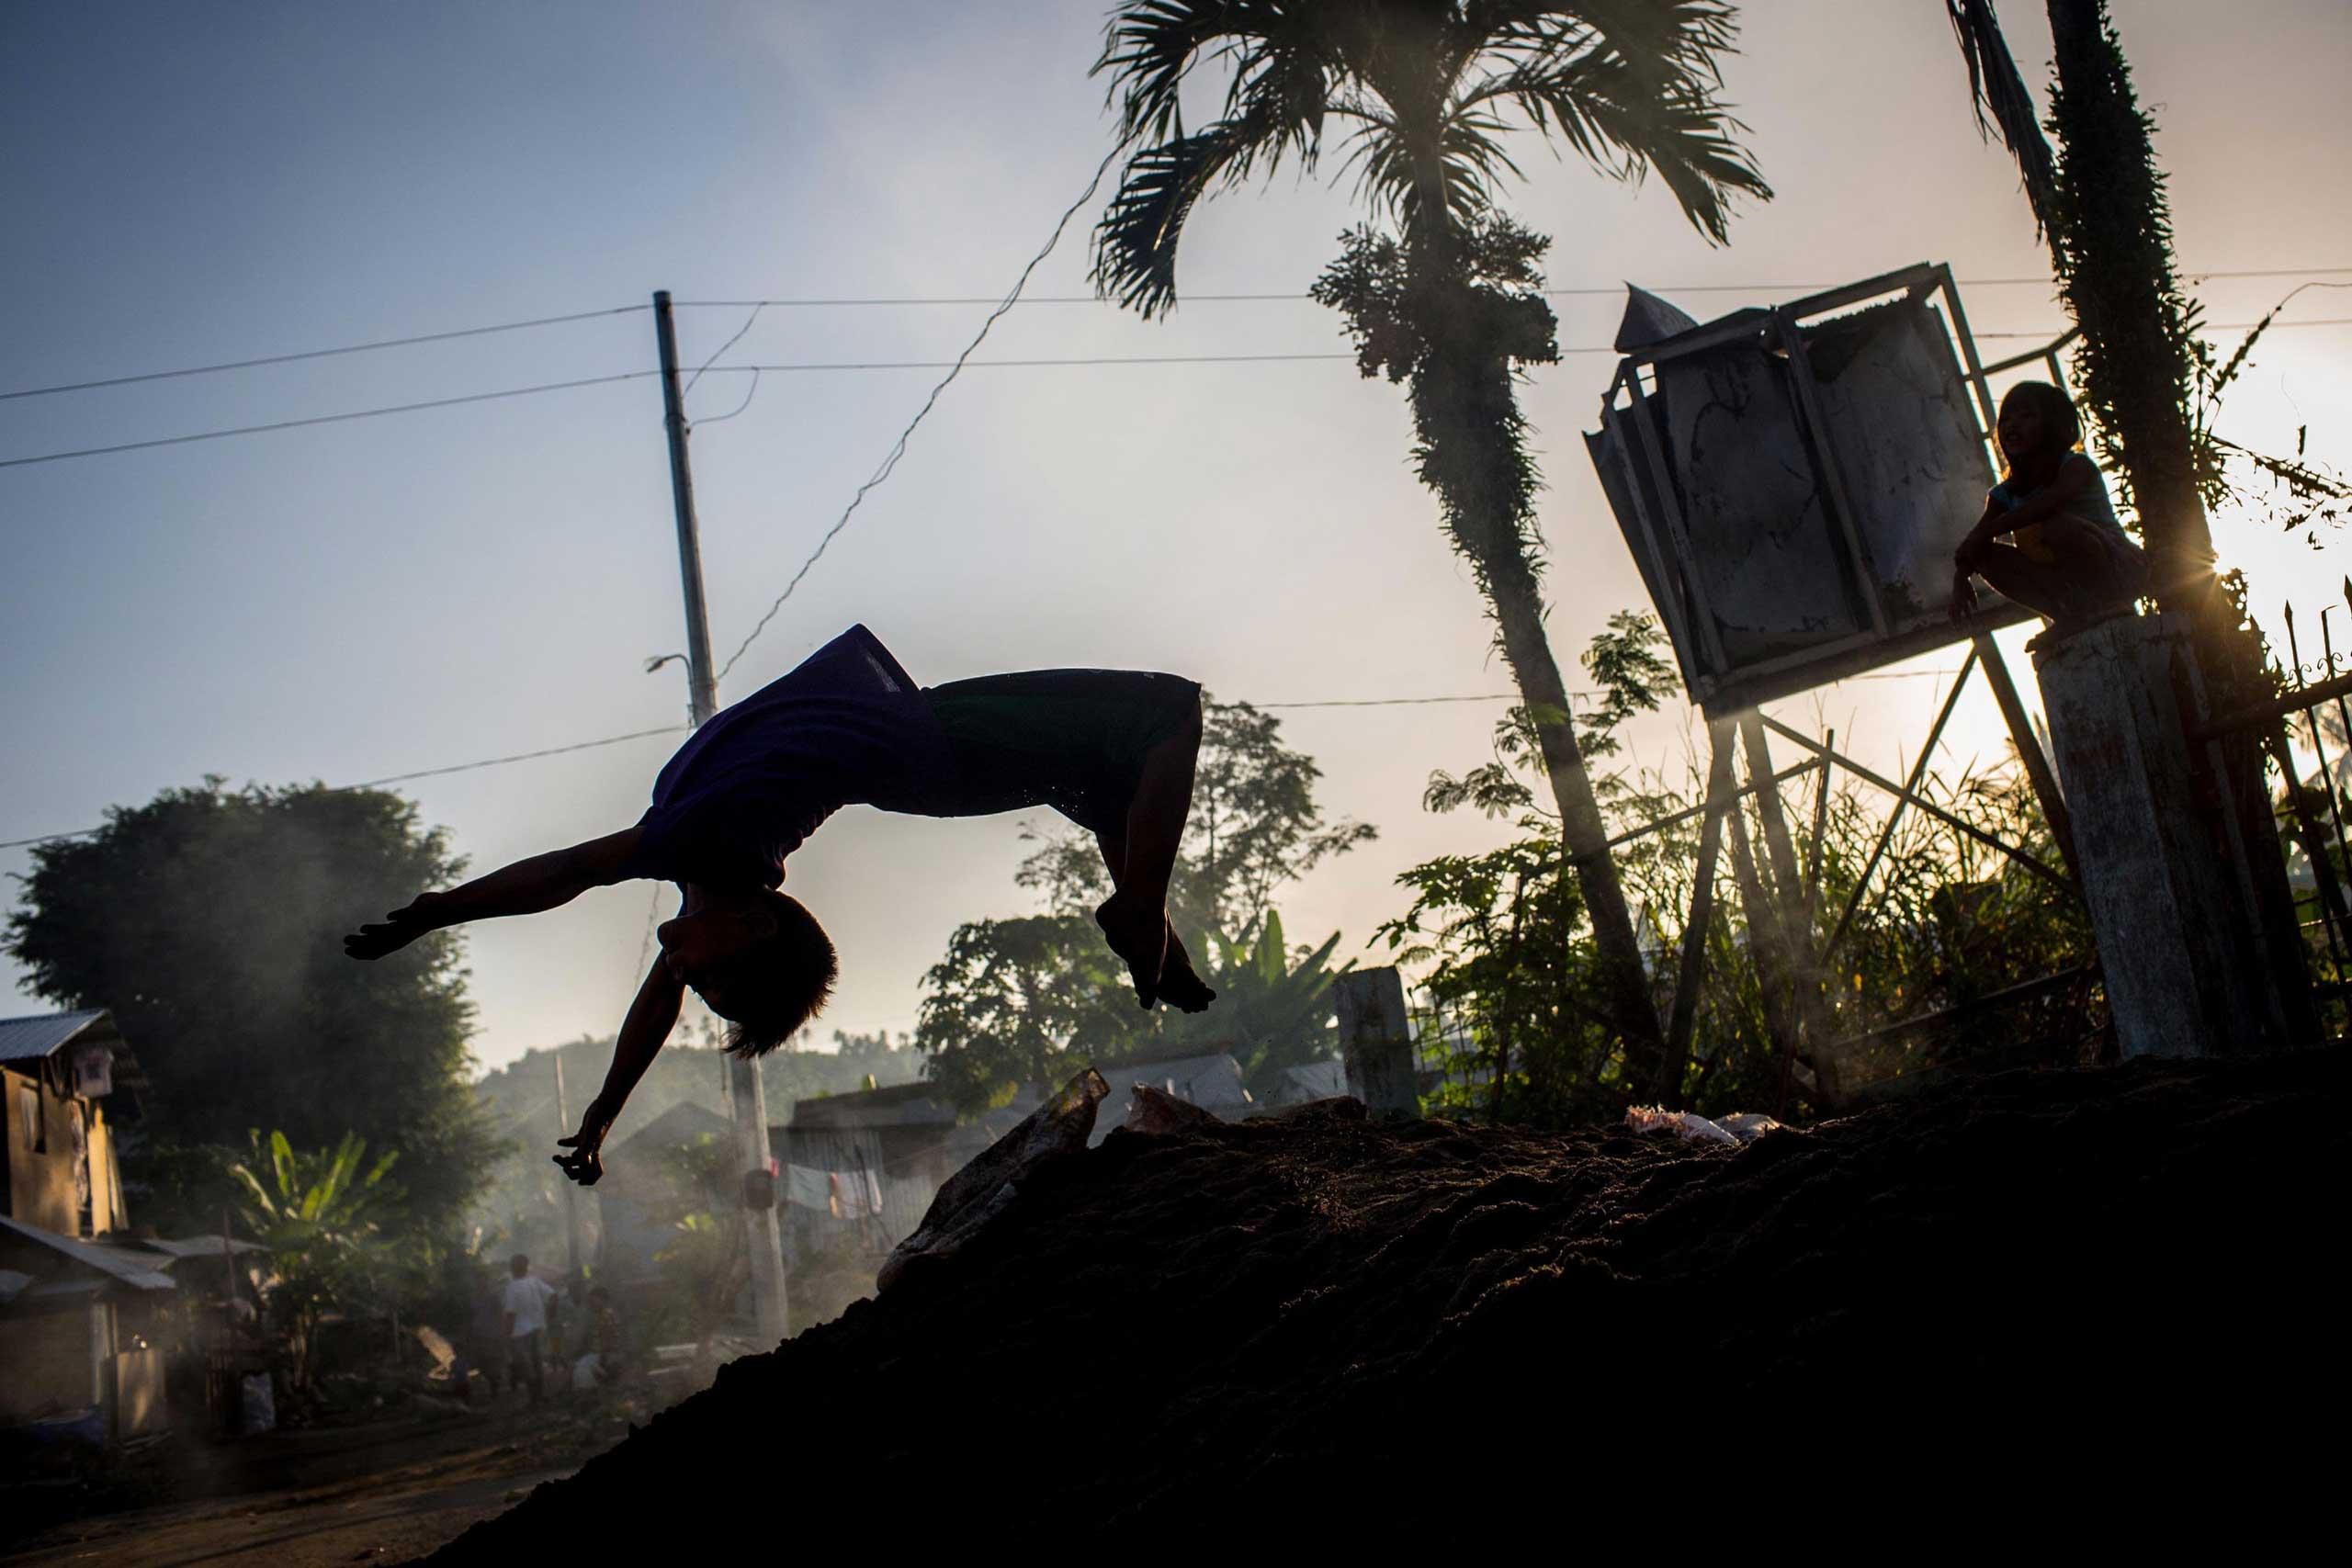 Nov. 6, 2014. A boy does a backflip off a mound of dirt in San Antonio, Samar, Philippines.